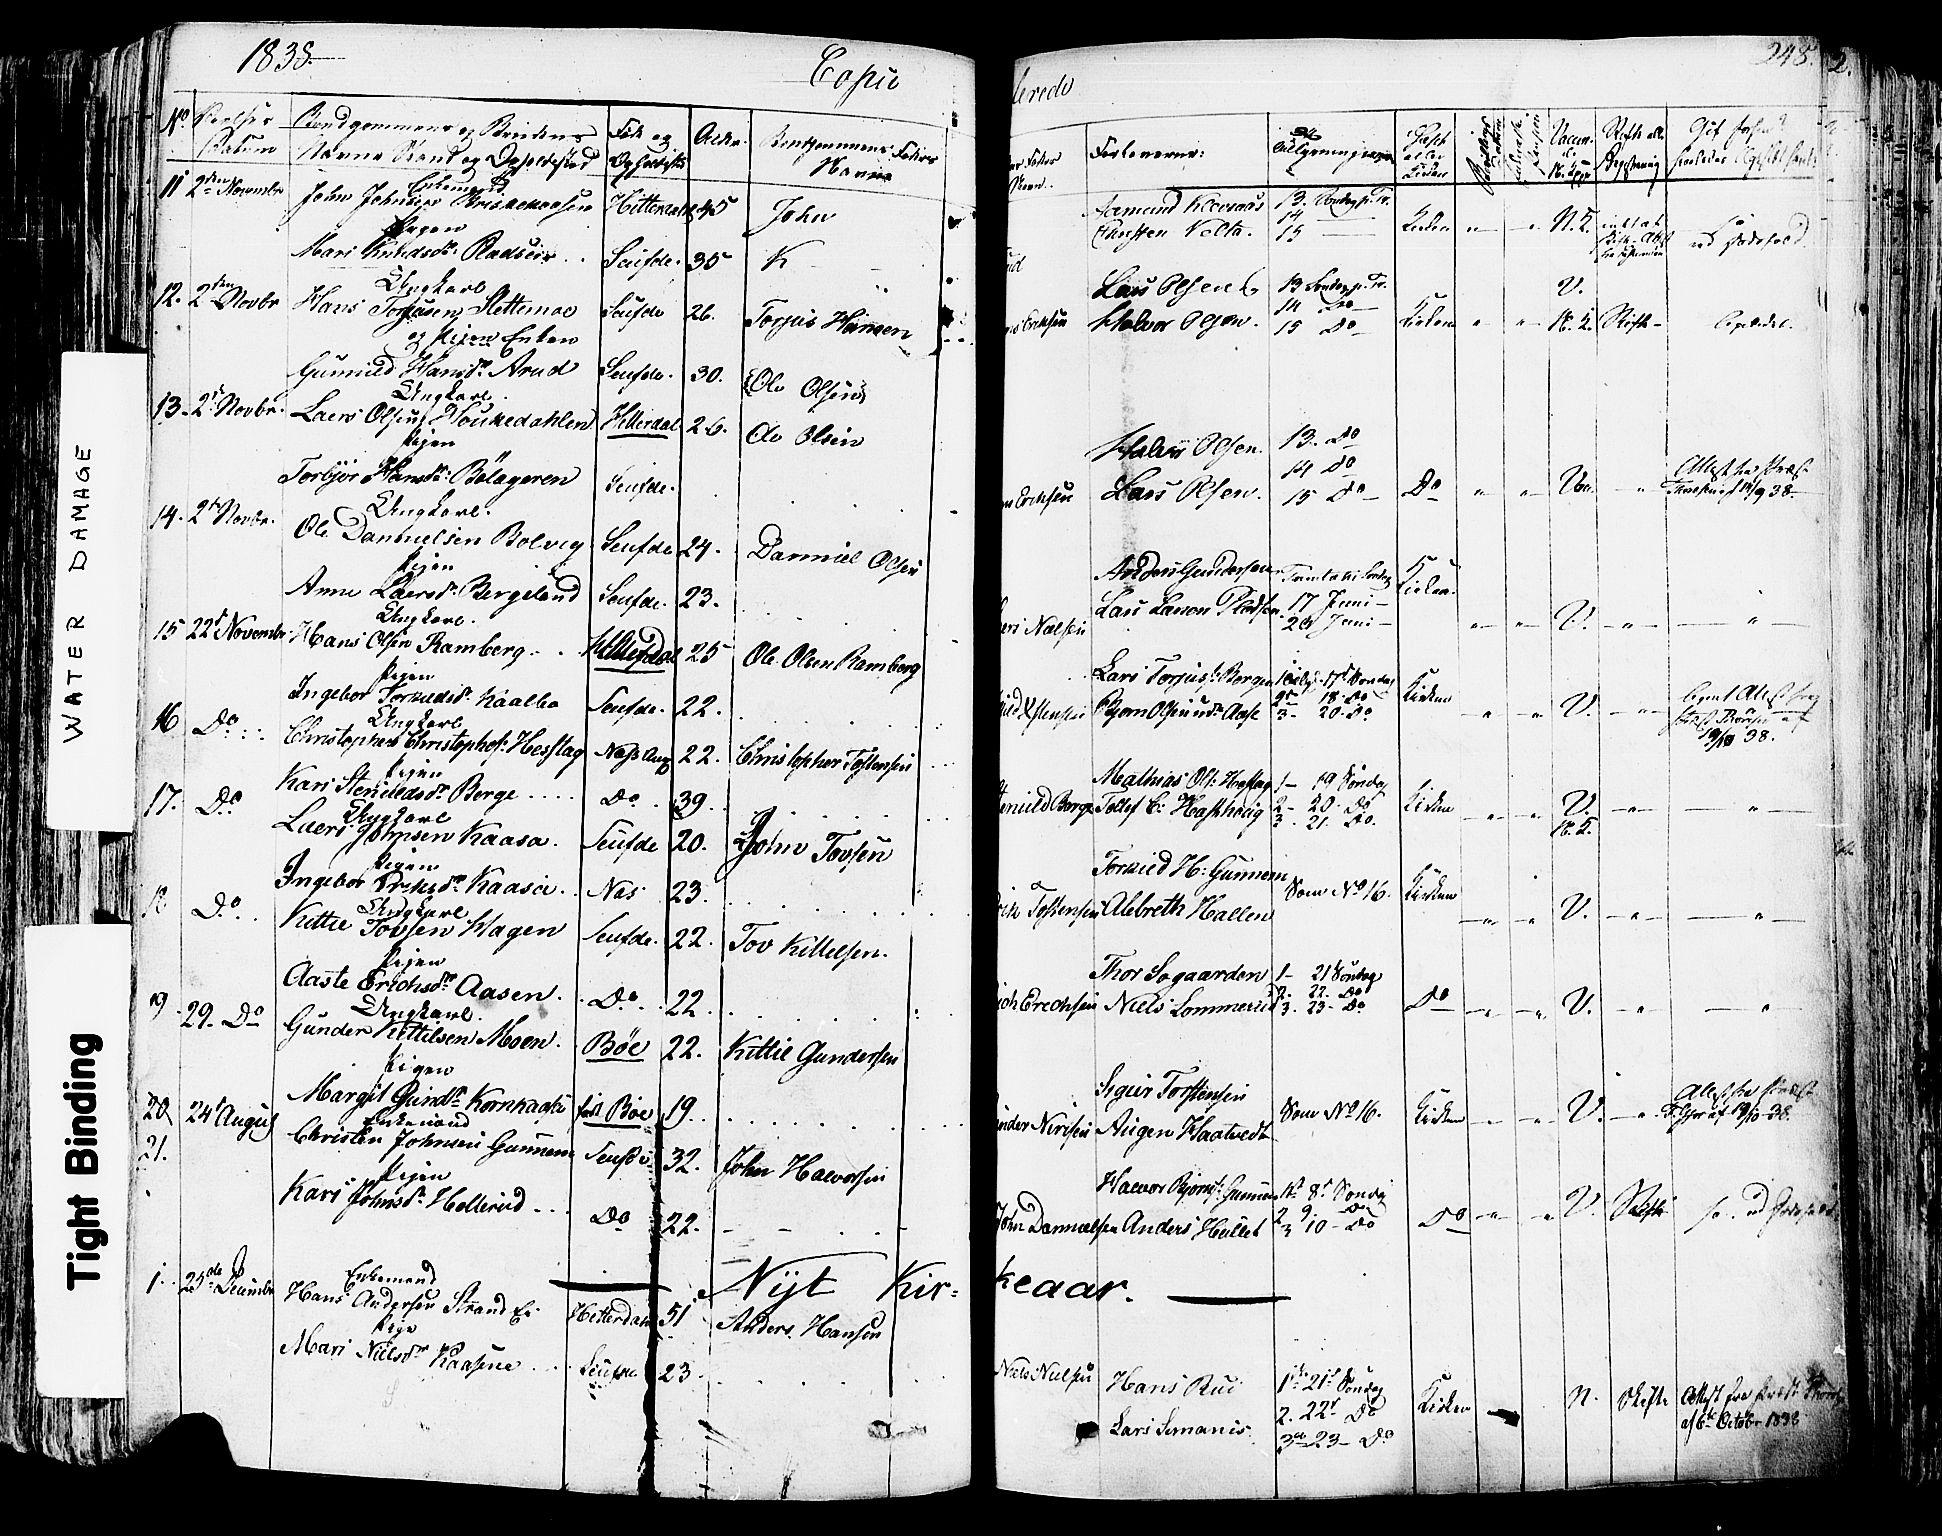 SAKO, Sauherad kirkebøker, F/Fa/L0006: Ministerialbok nr. I 6, 1827-1850, s. 248